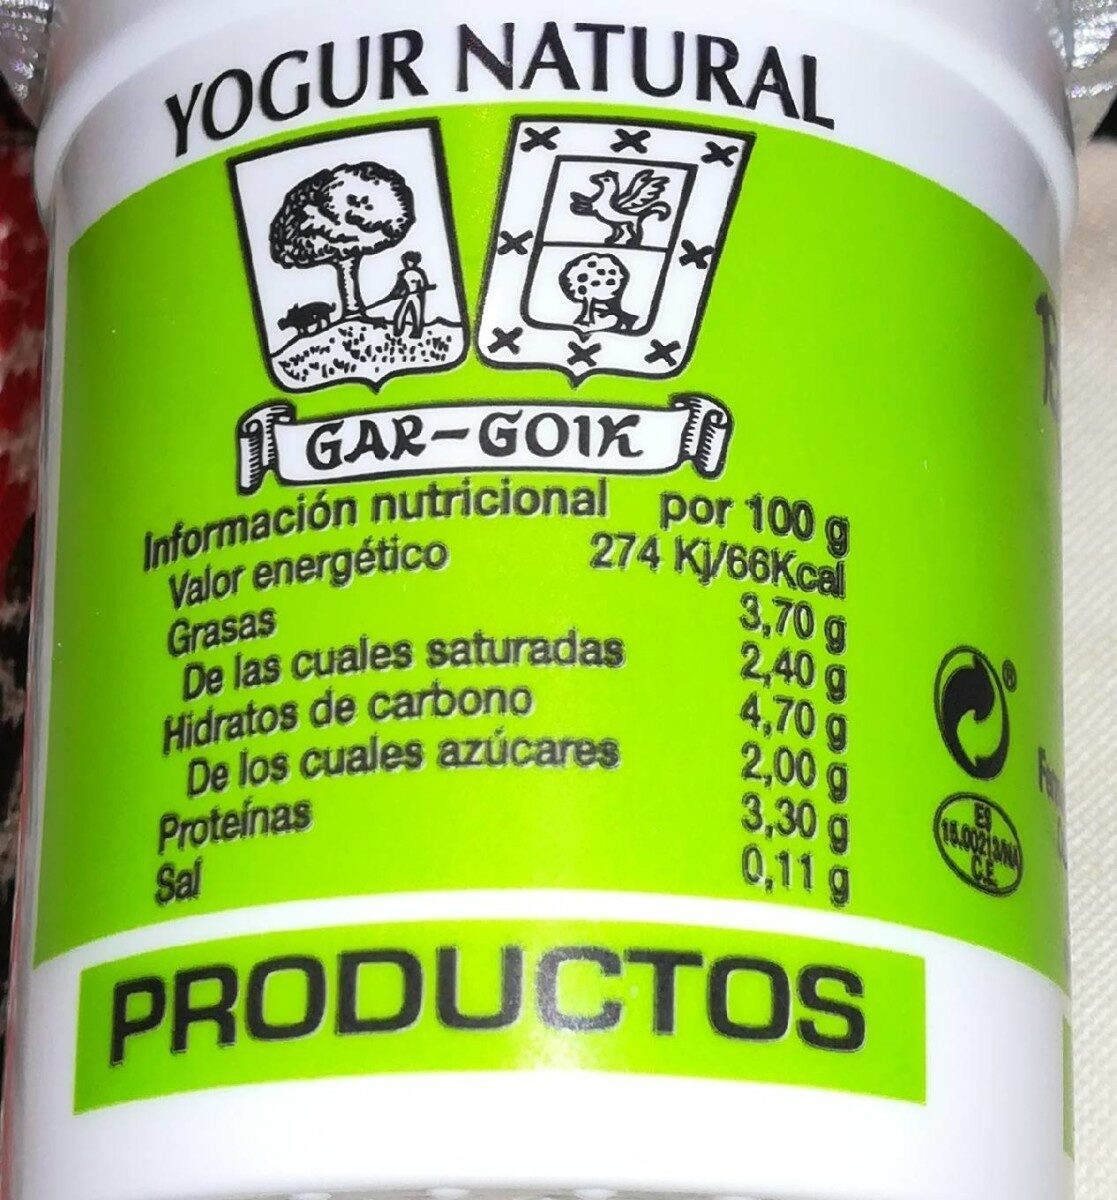 Yogur natural - Nutrition facts